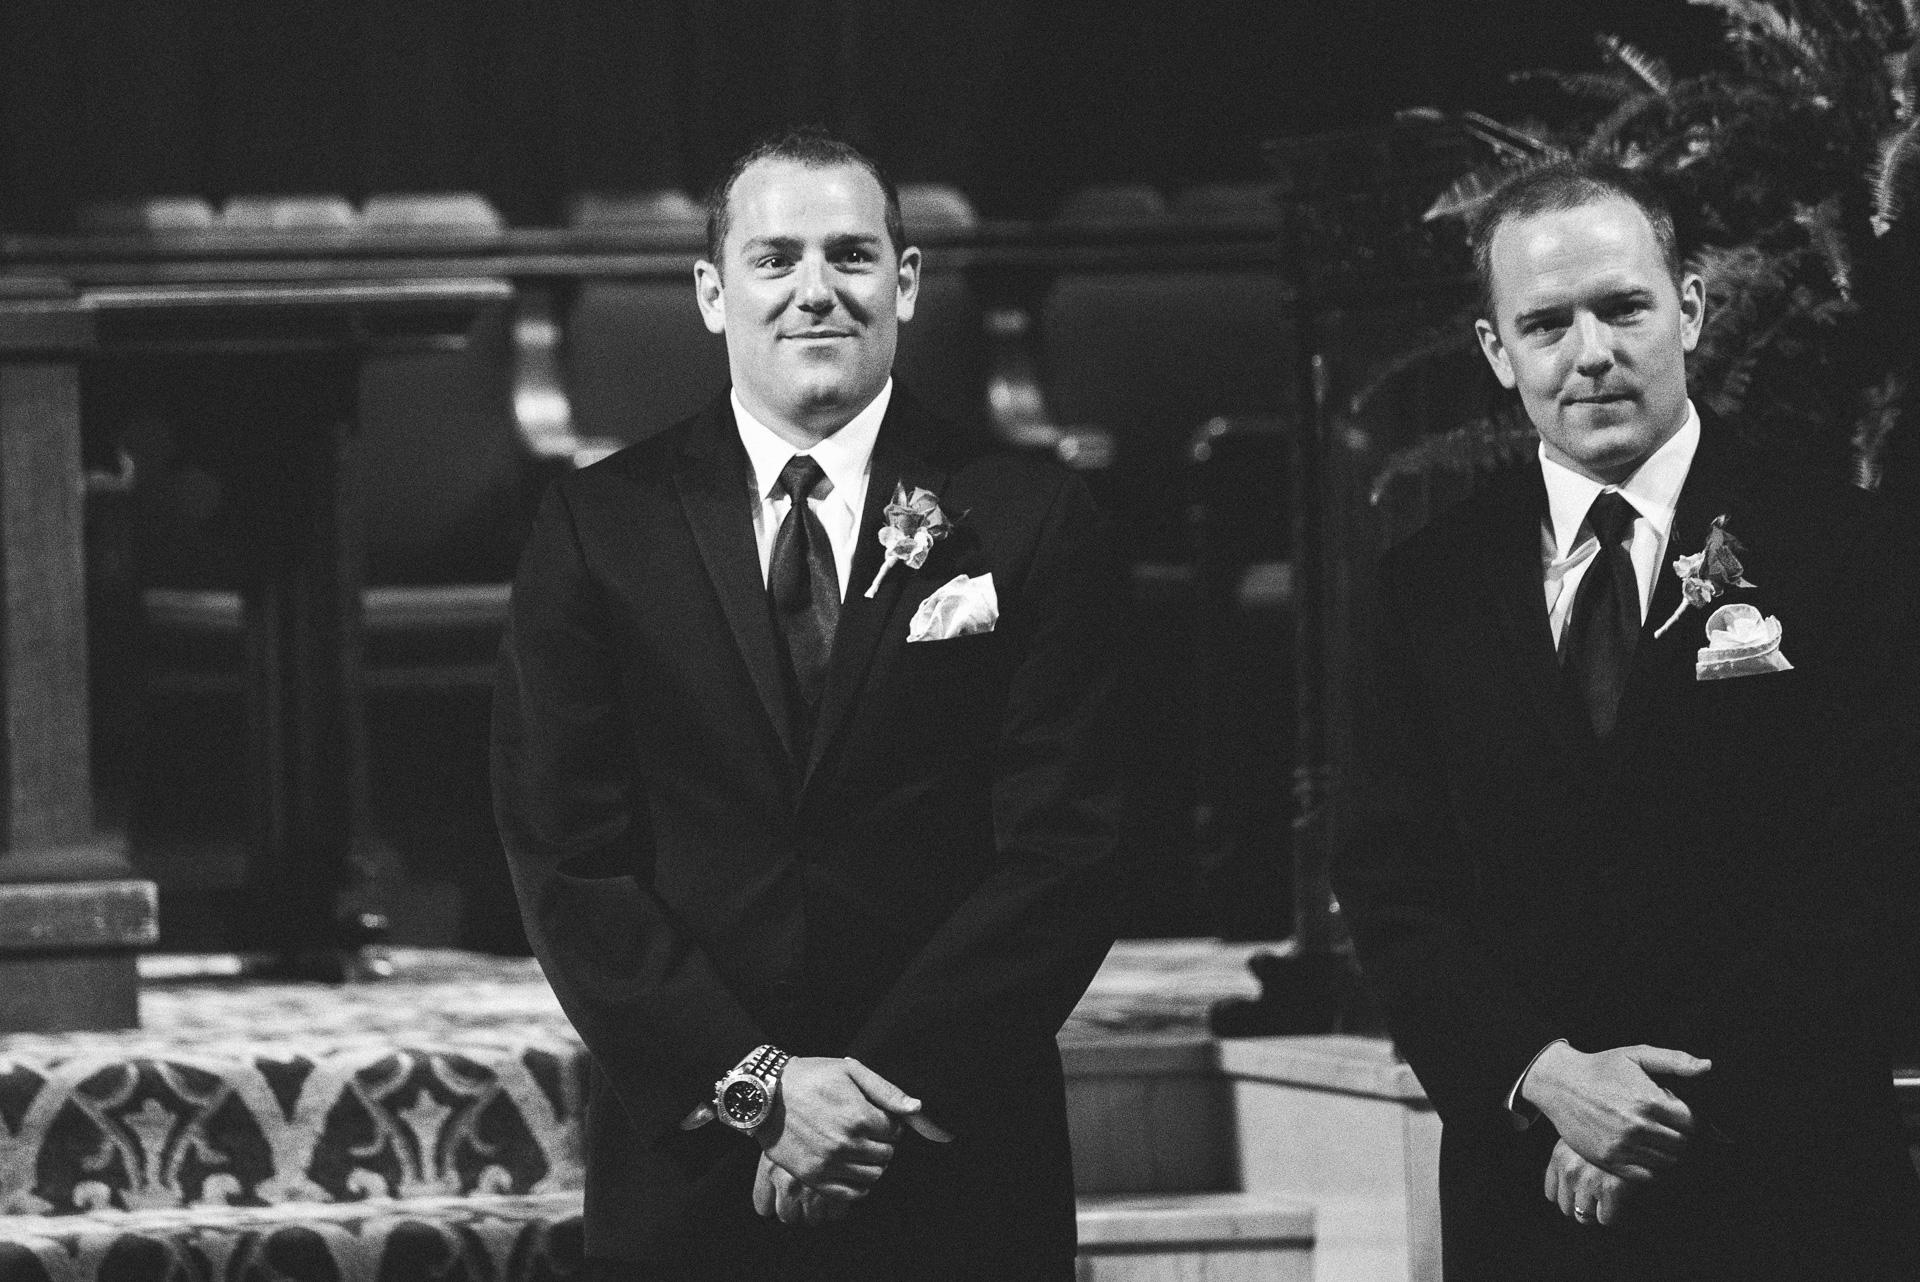 Dayton Wedding Photographer - Groom sees Bride